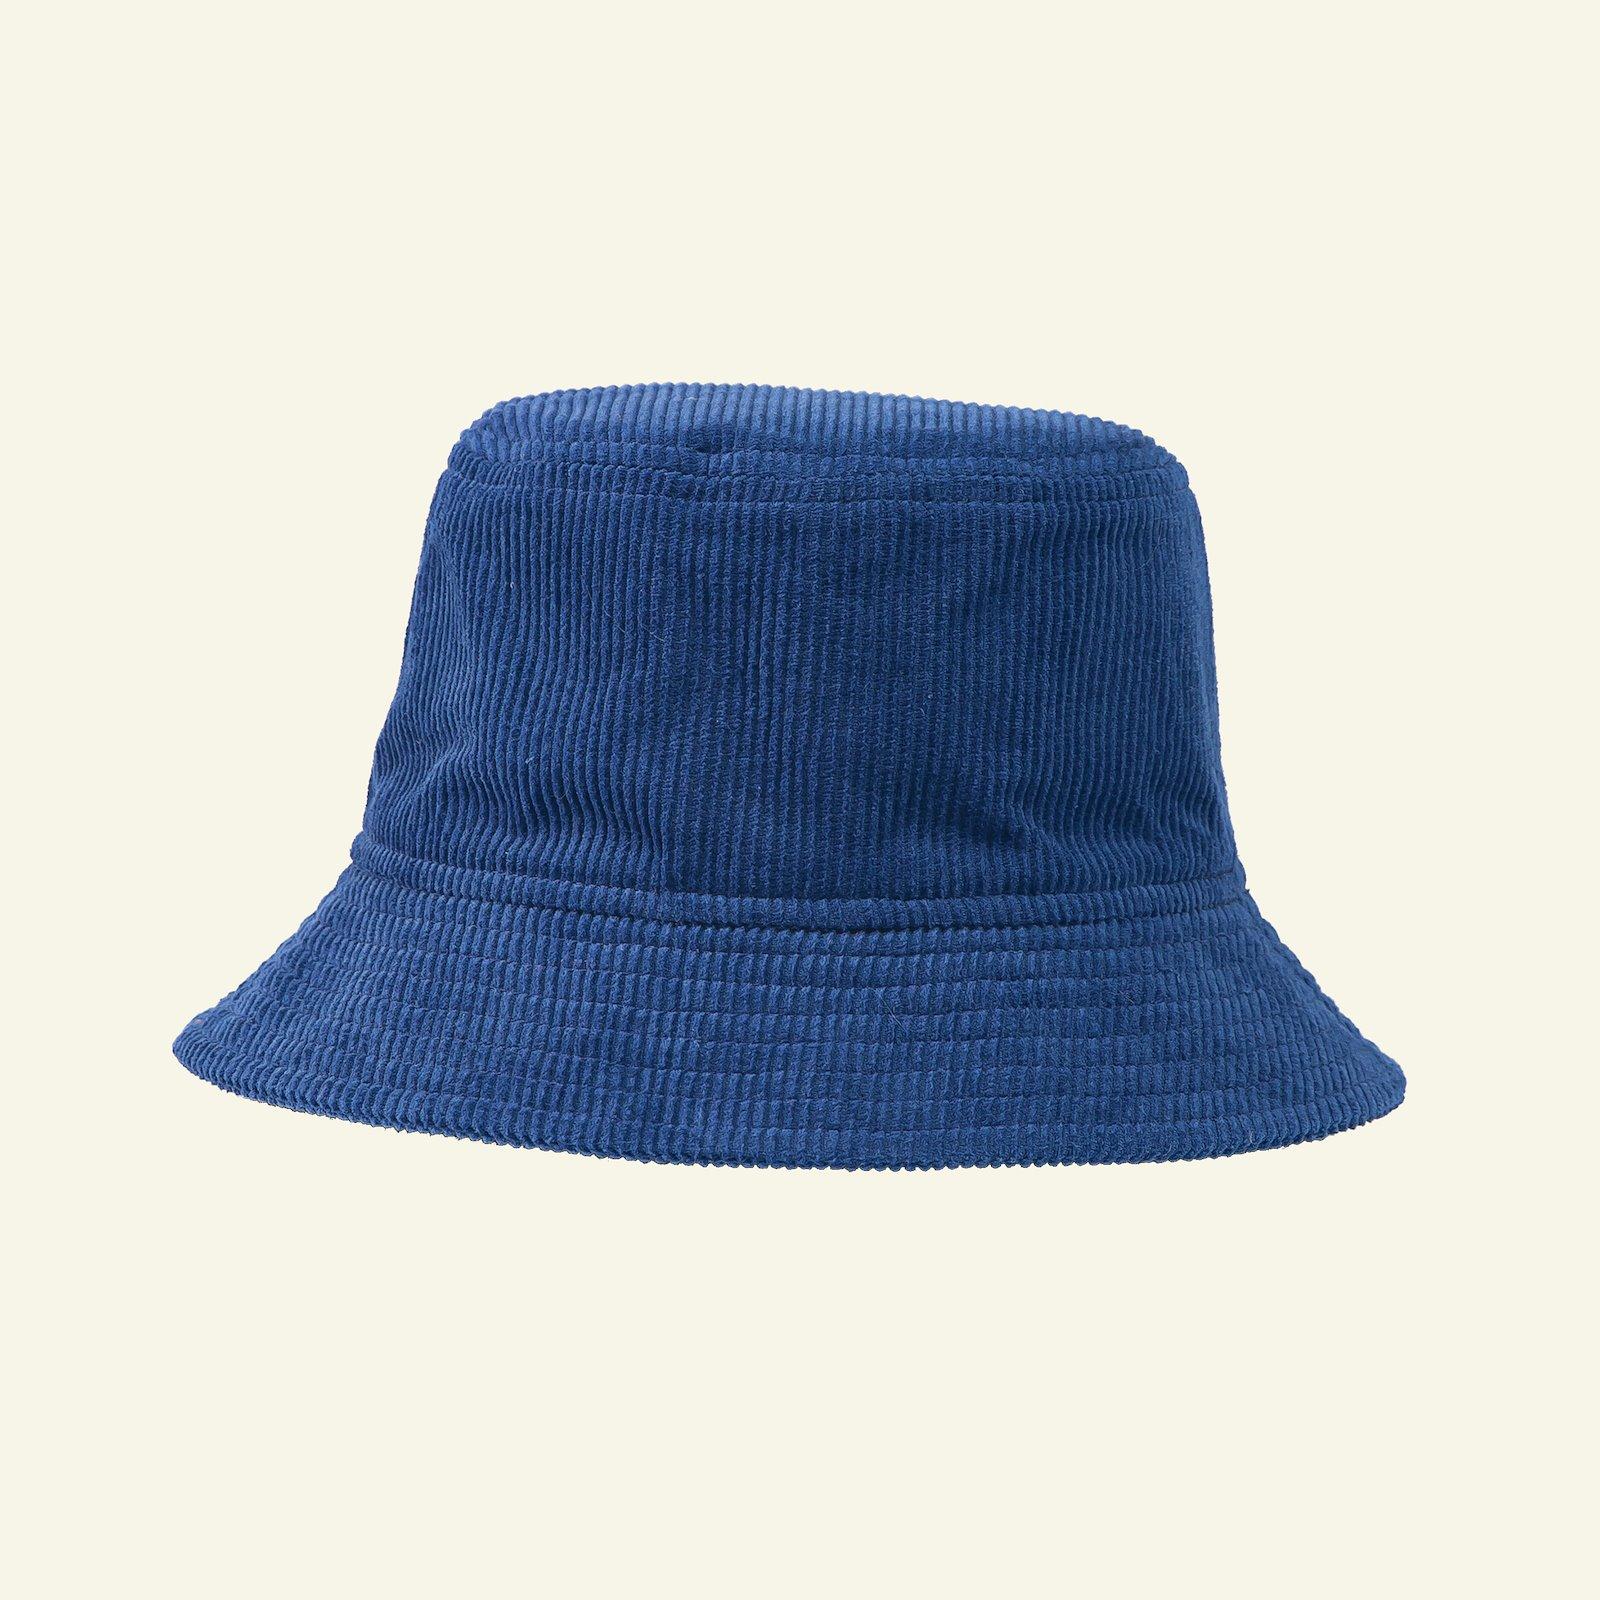 Corduroy 8 wales dark cobalt blue p90325_430820_sskit